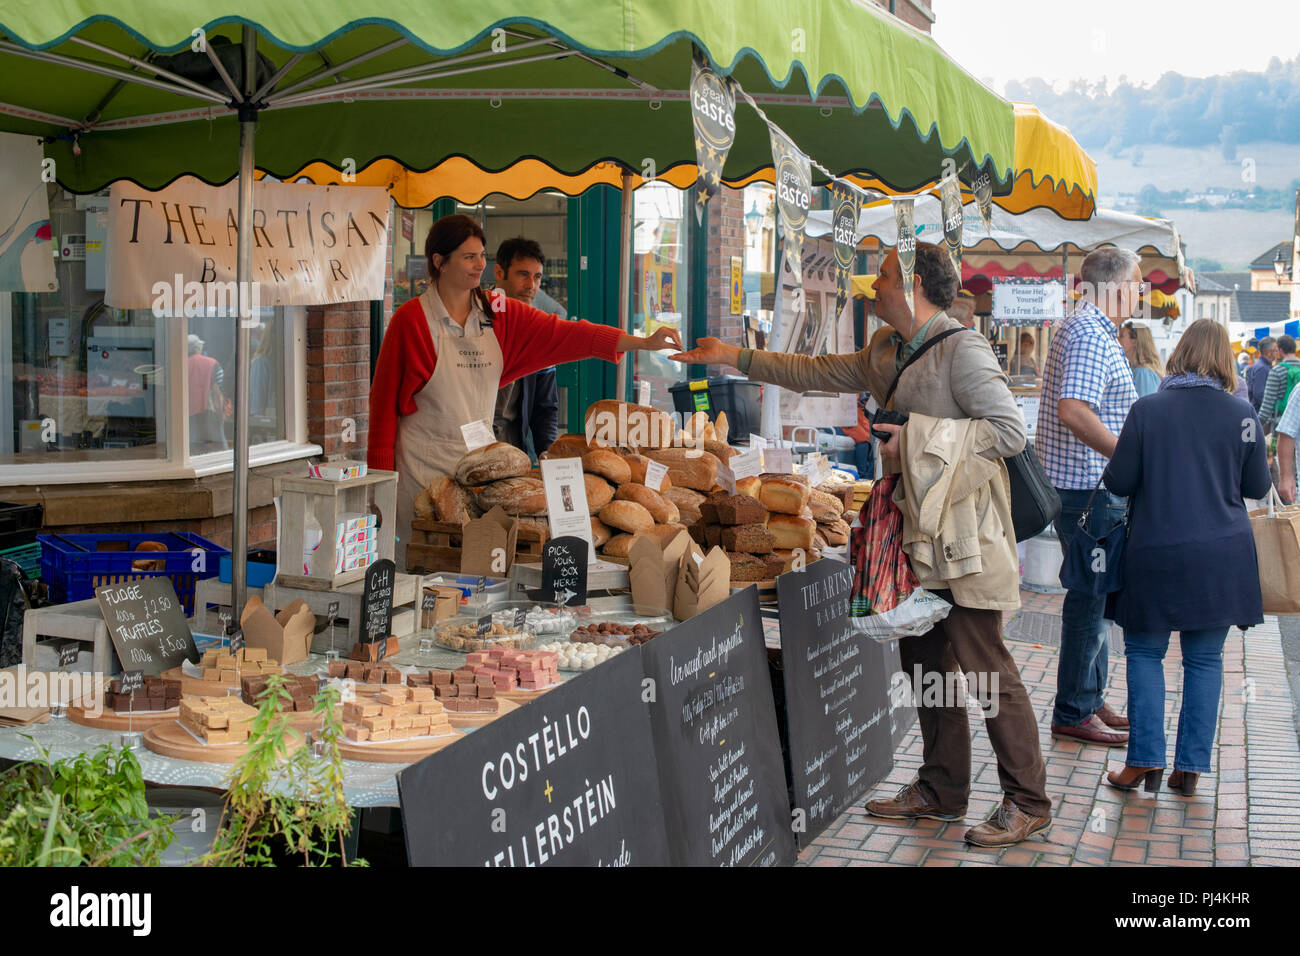 Stroud farmers market. Stroud, Gloucestershire, England - Stock Image